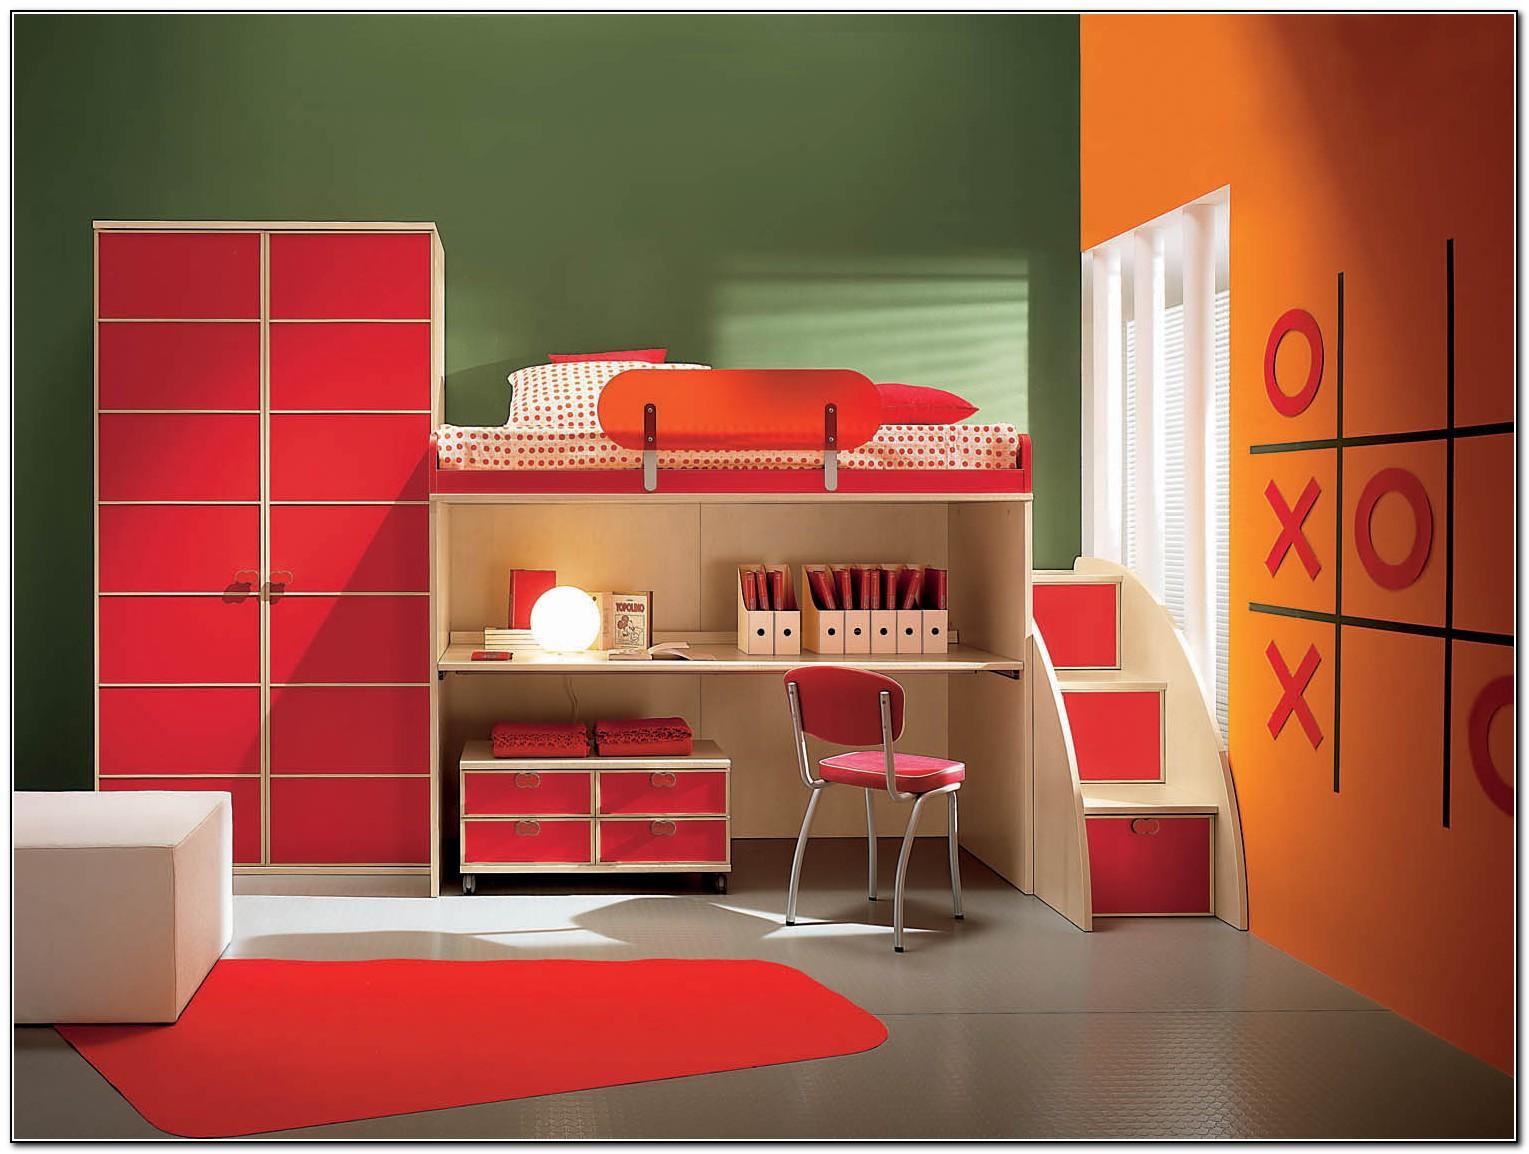 Bed For Kids Room